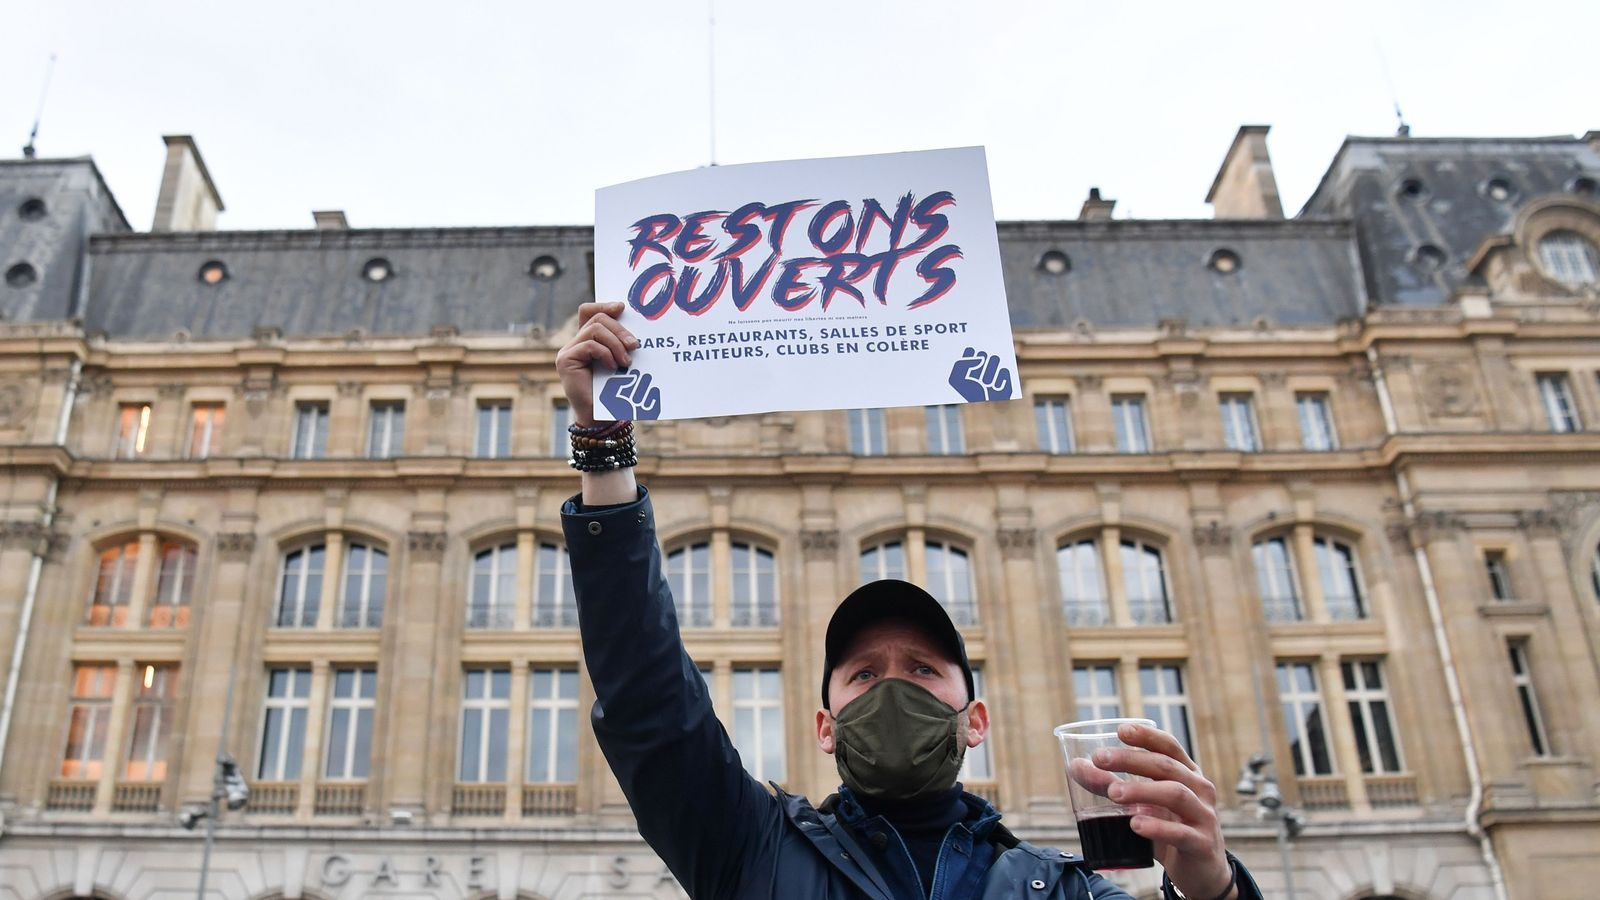 Europa lidera l'augment de casos de coronavirus